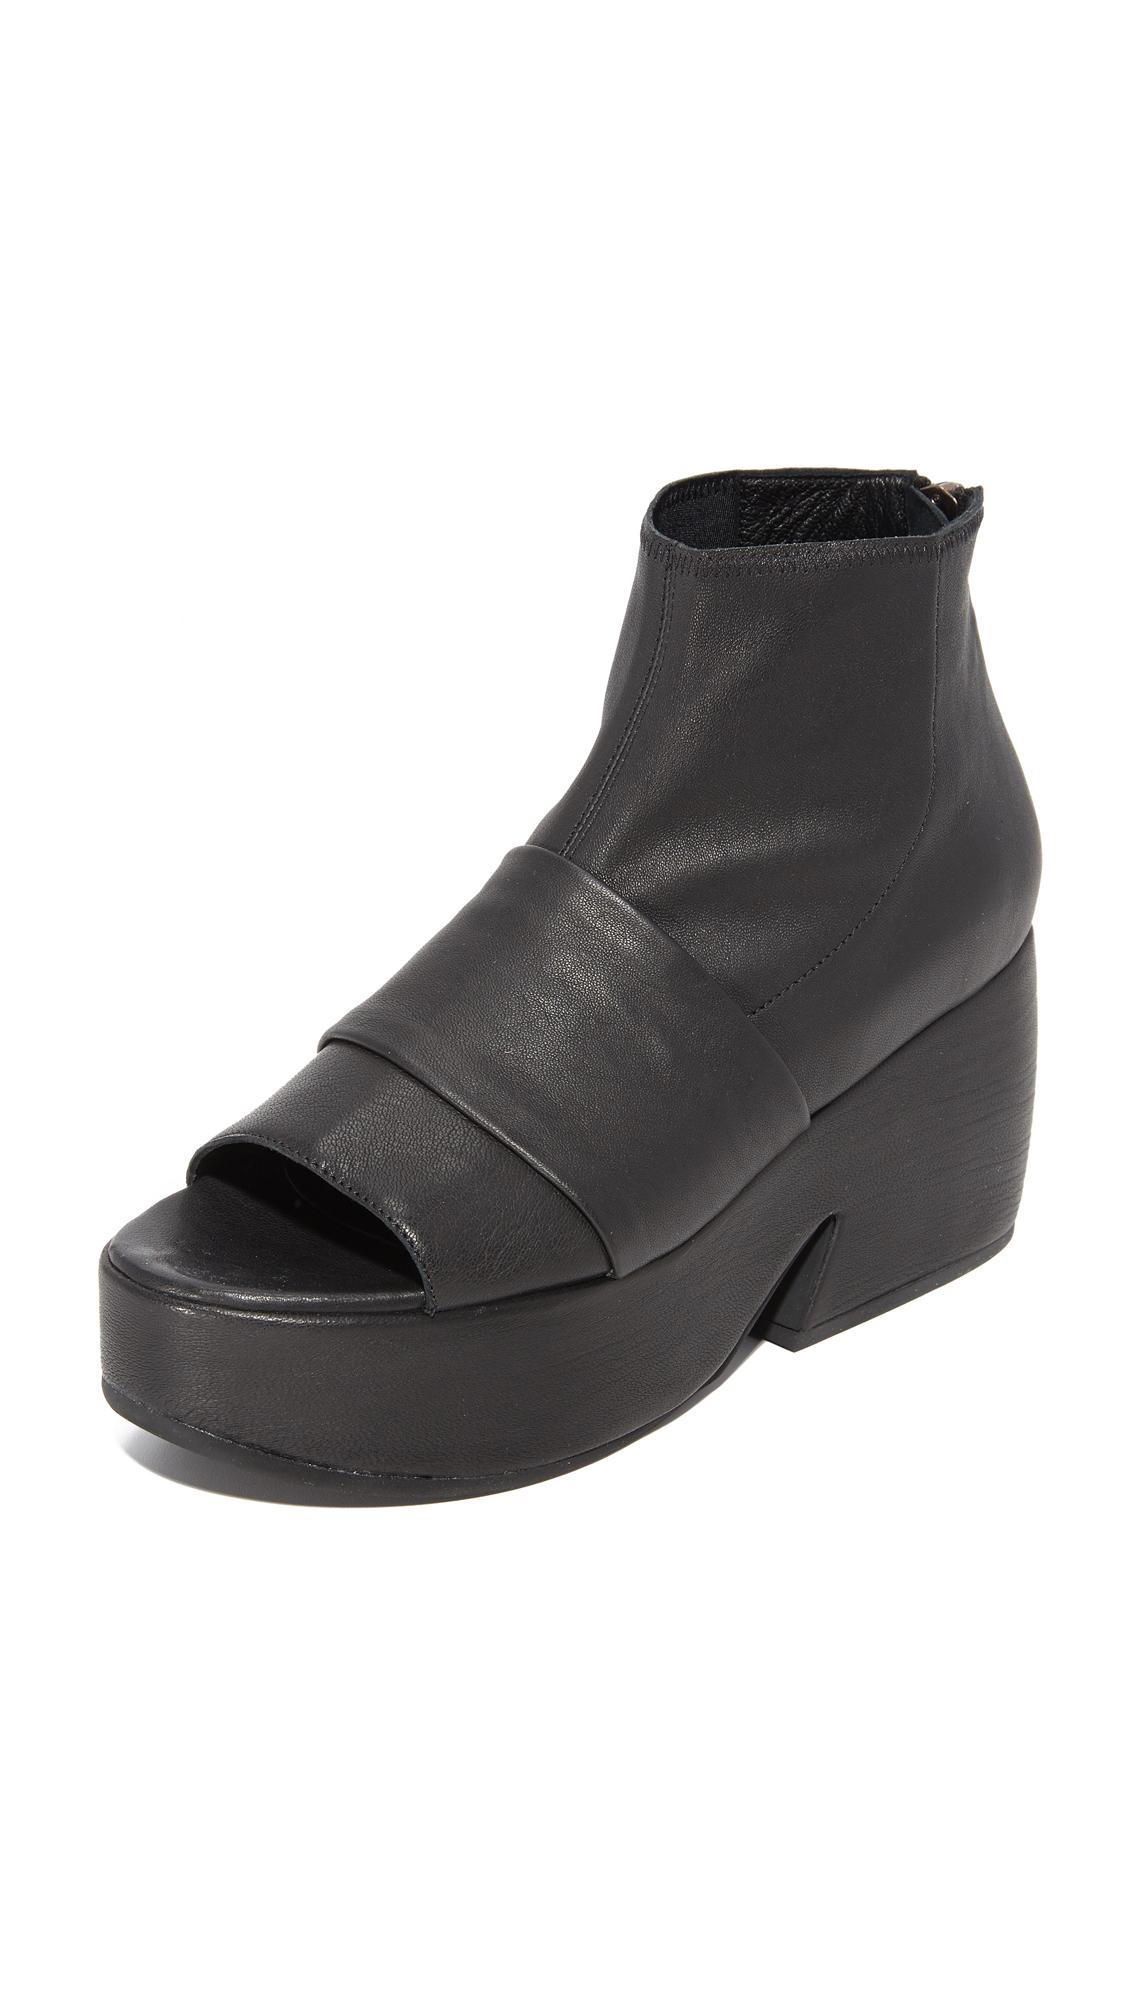 Photo of Ld Tuttle The Tilt Open Toe Platform Booties Black - LD Tuttle online